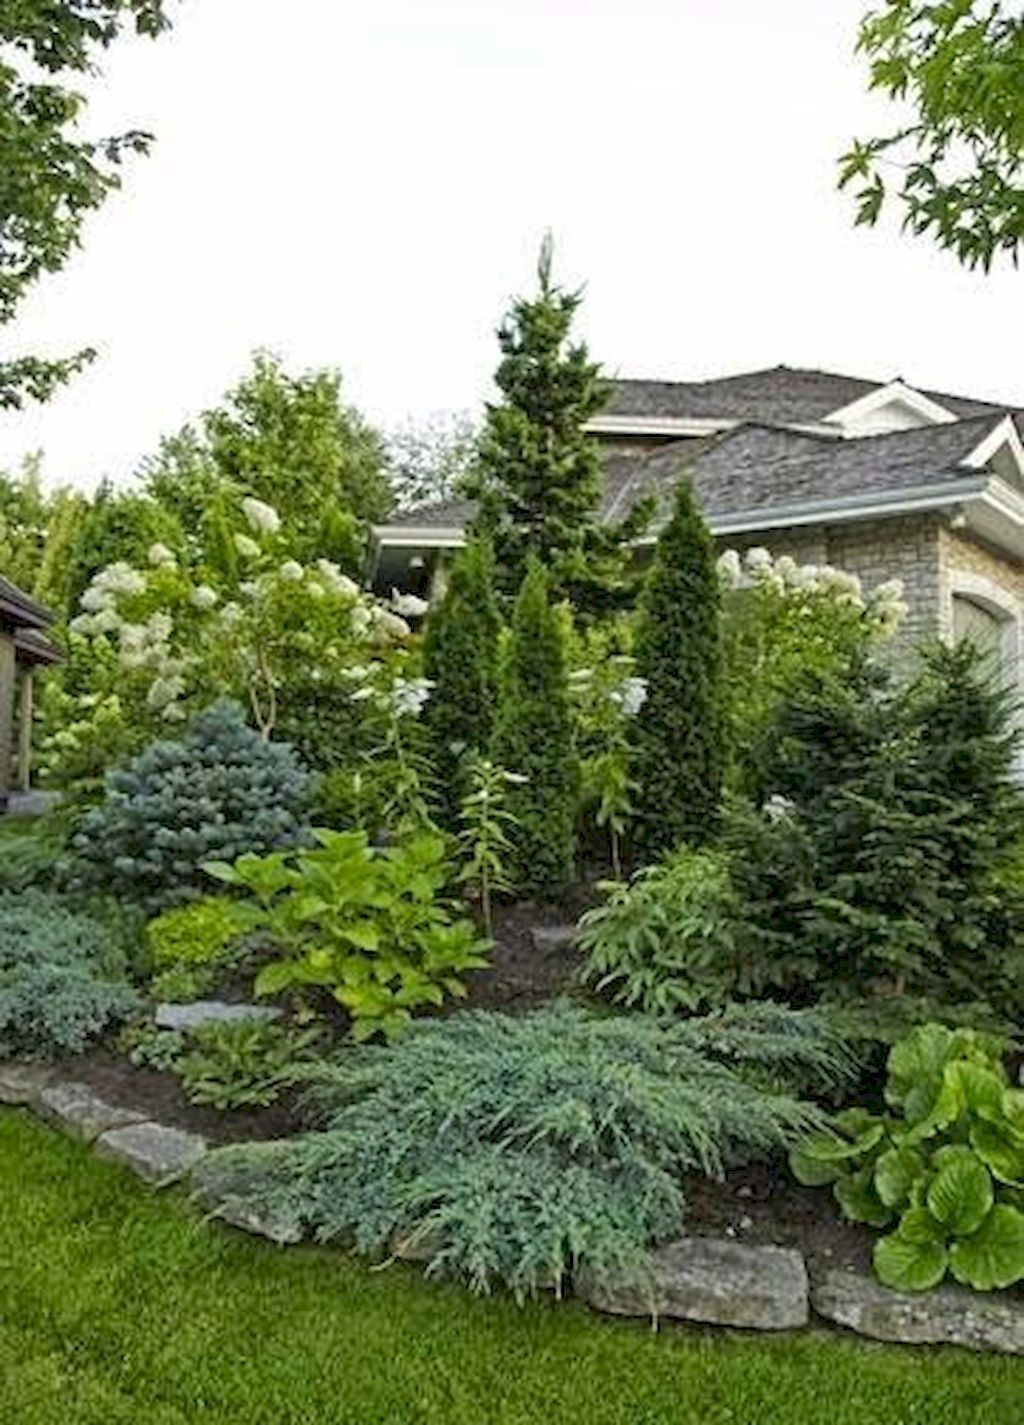 47 Inspiring Small Front Yard Landscaping Ideas #smallfrontyardlandscapingideas